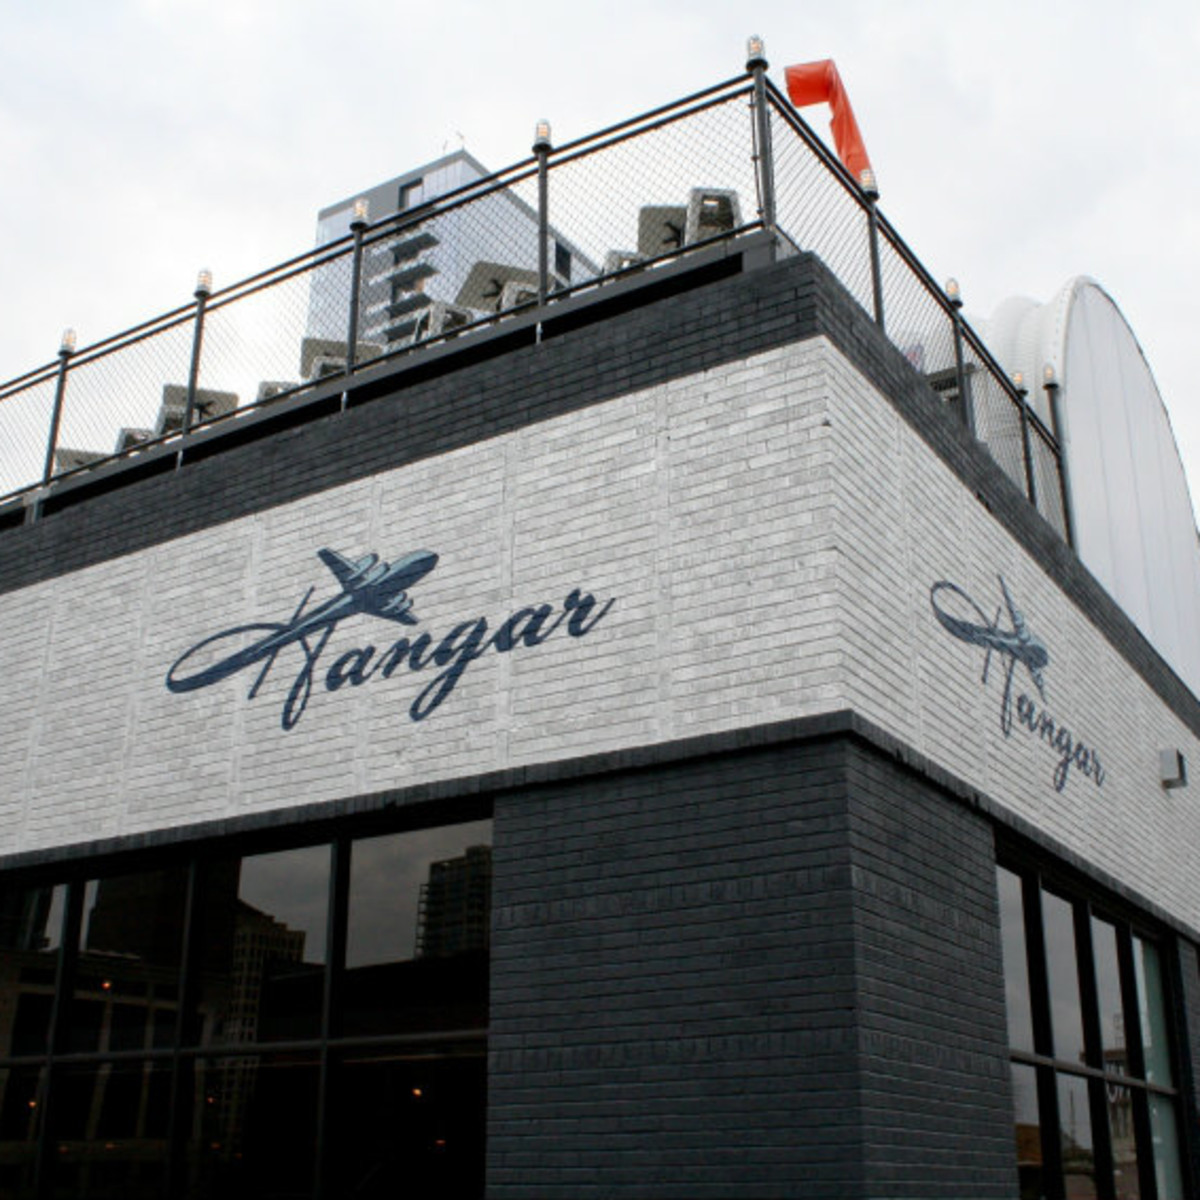 Austin_photo: places_drinks_hangar lounge_exterior